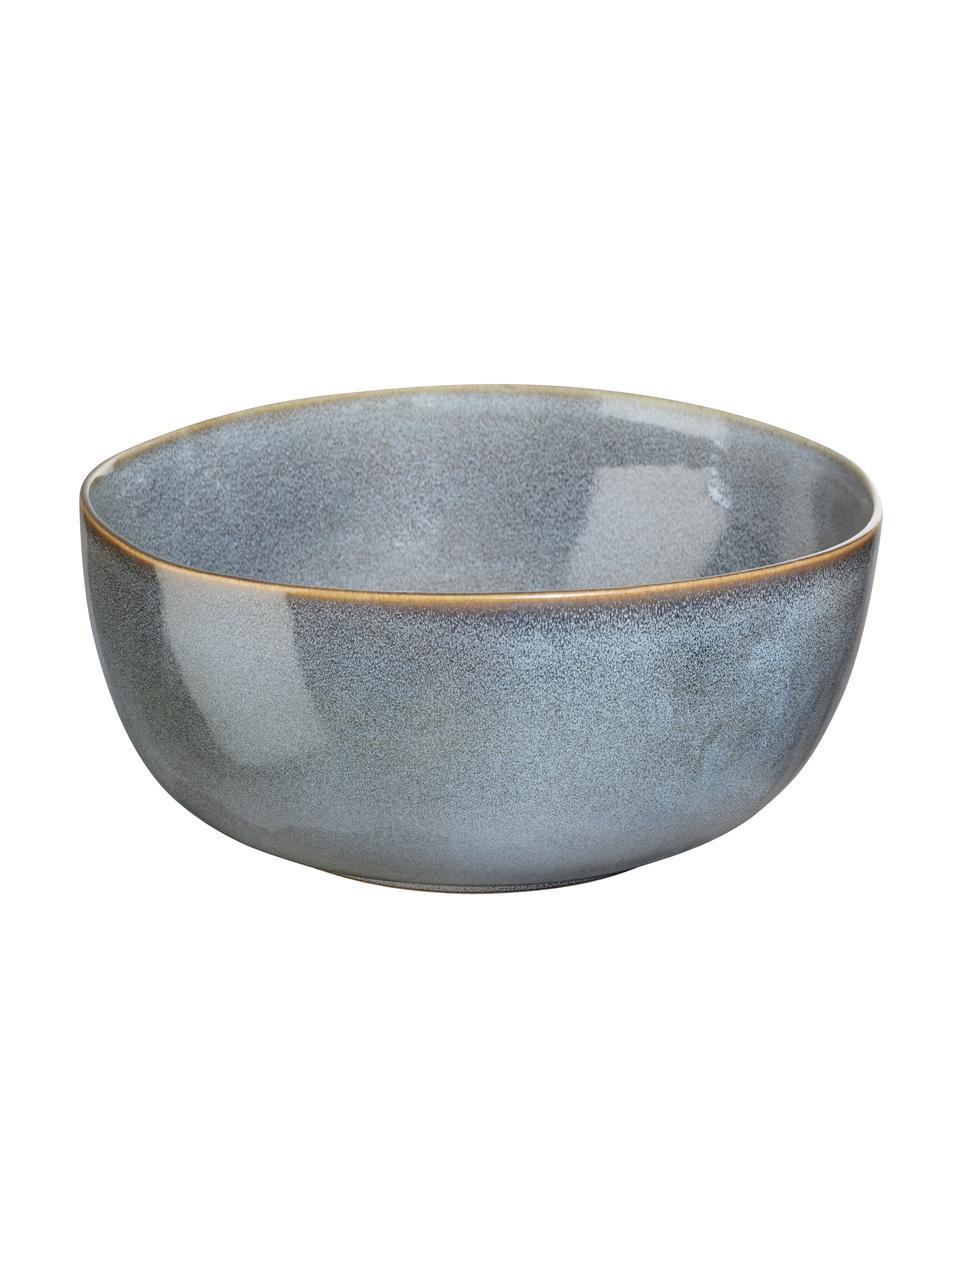 Saladeschaal Saisons van keramiek in blauw, Ø 22 cm, Keramiek, Blauw, Ø 22 x H 11 cm